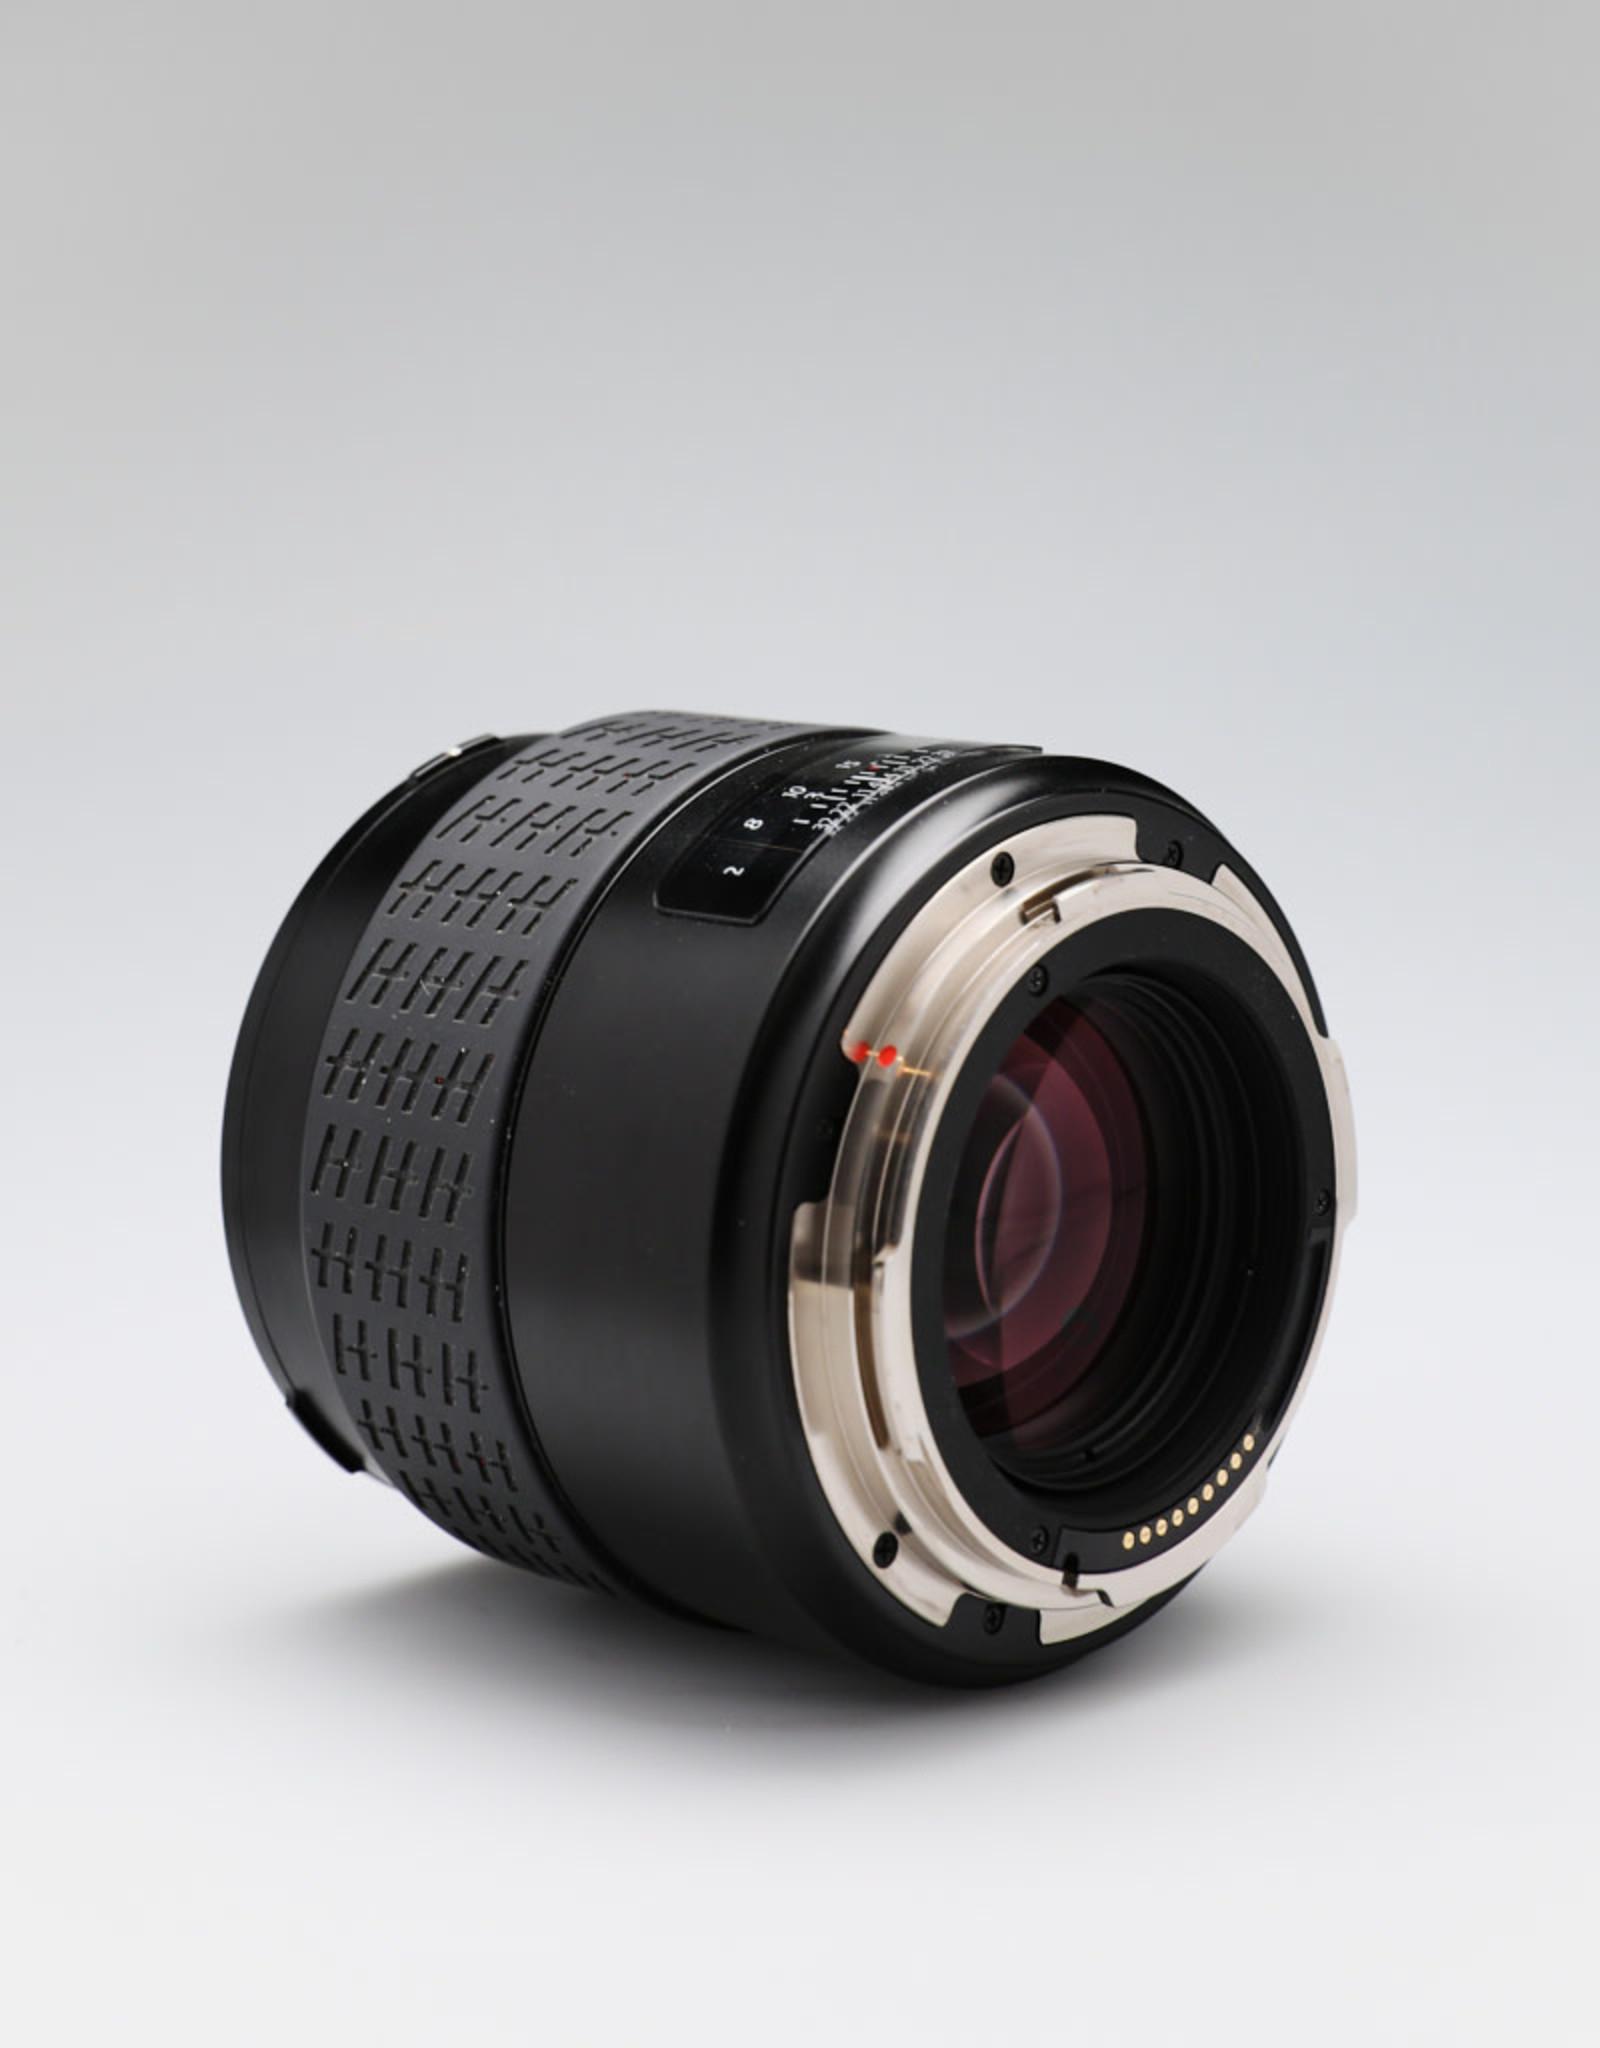 Hasselblad USED  Hasselblad HC 100mm F2.2 Lens